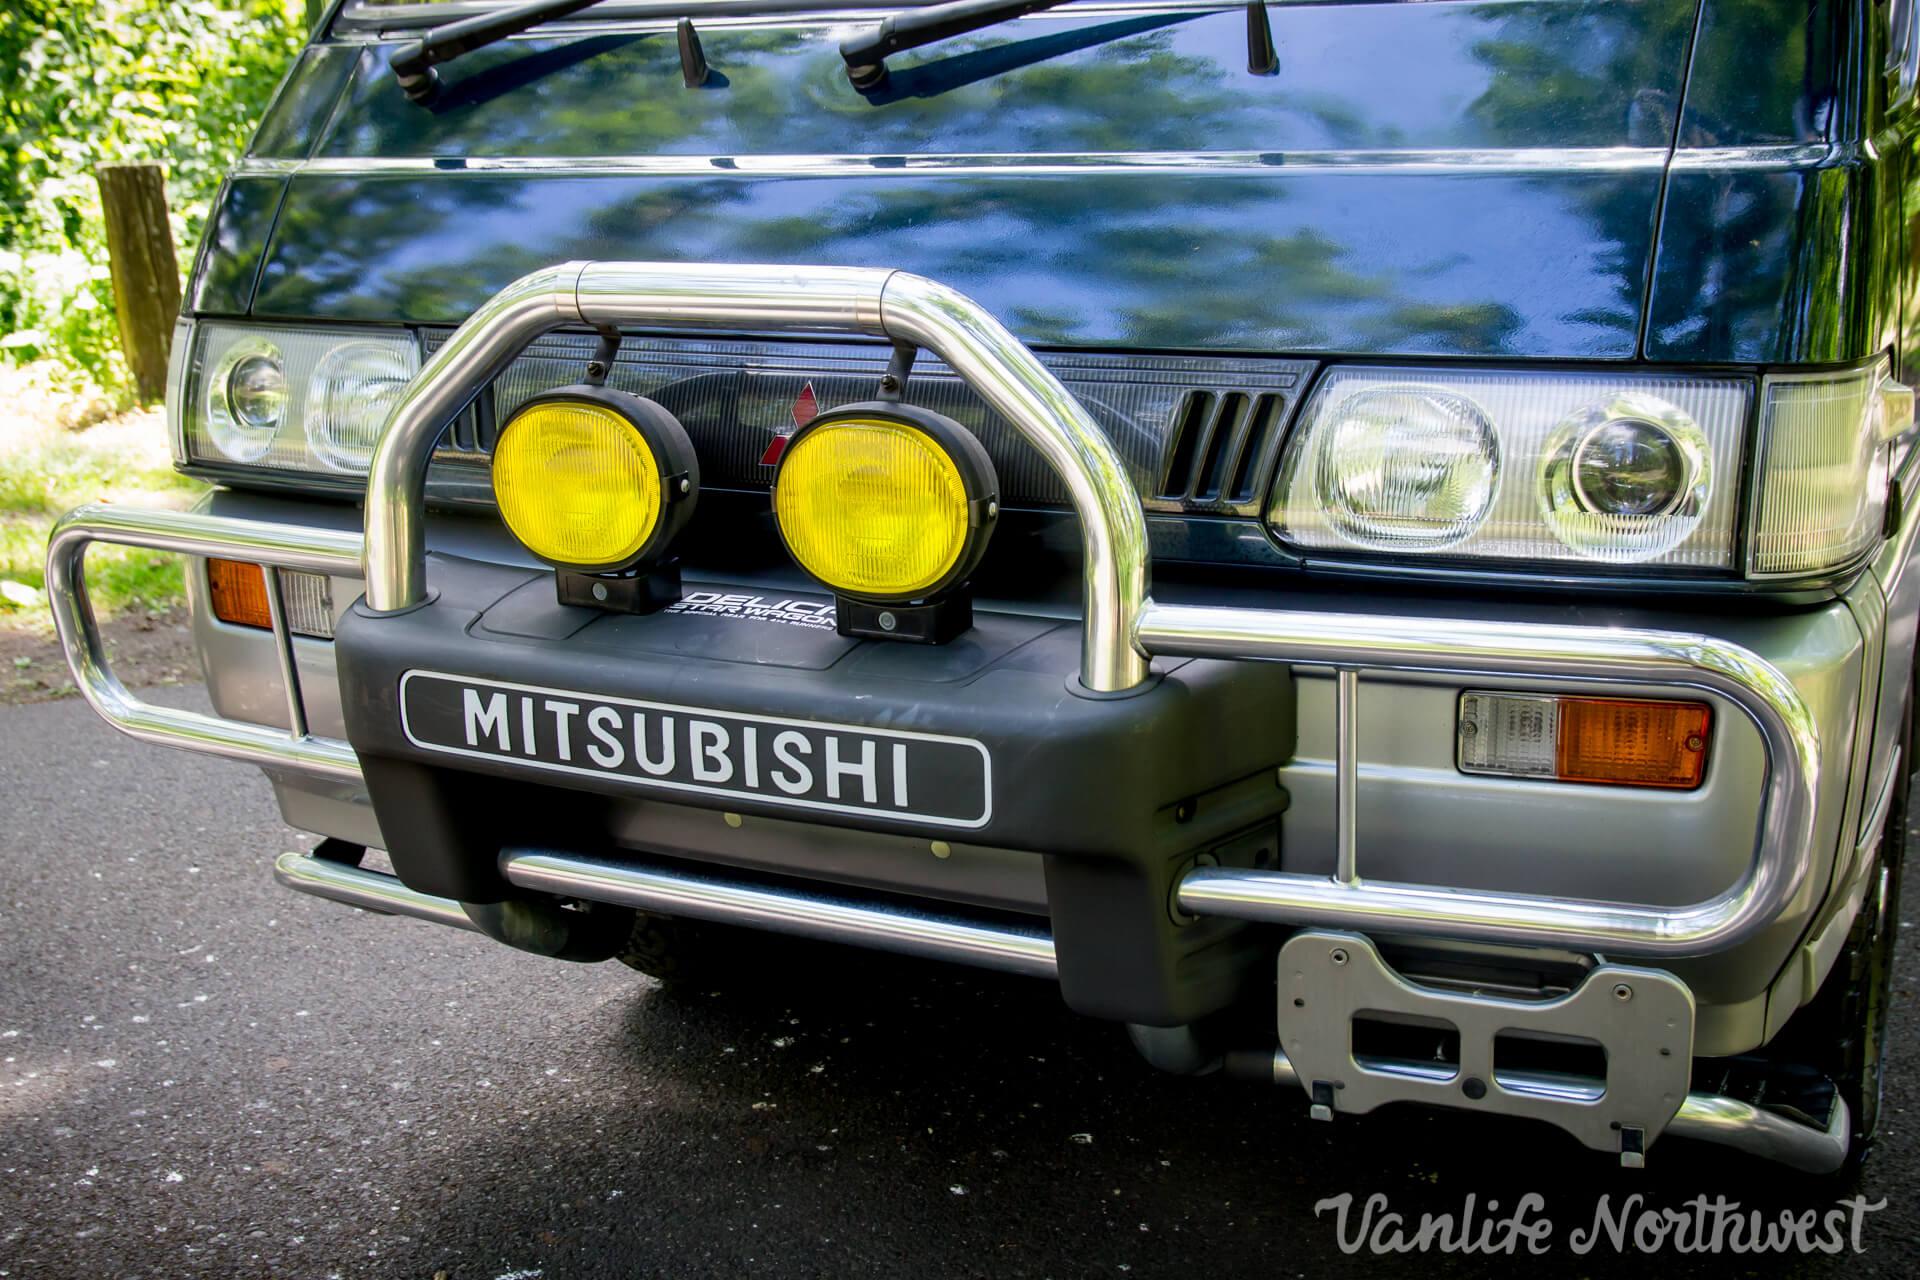 1991MitsubishiDelicaJames68k-8.jpg